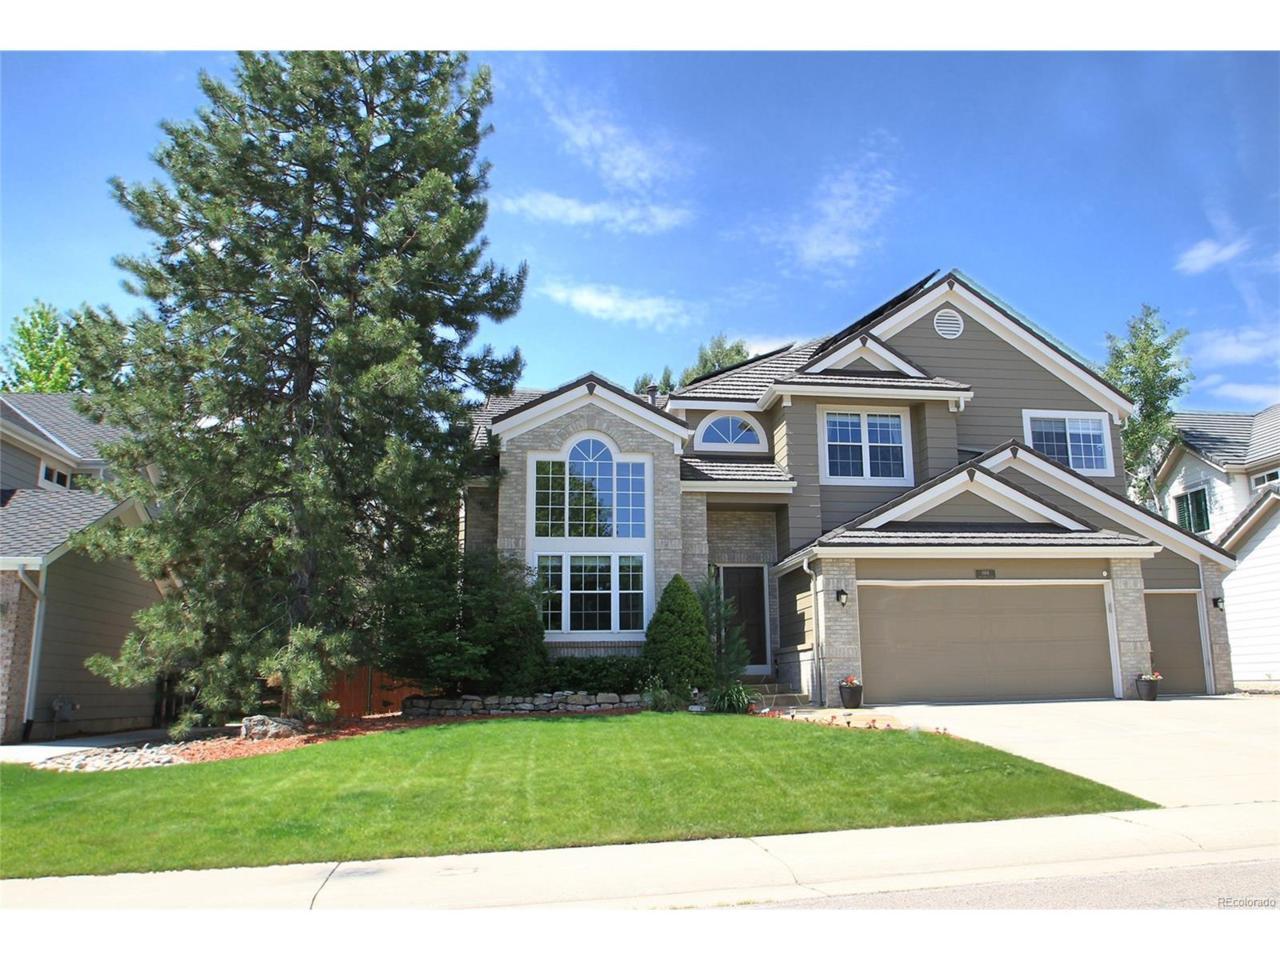 8164 Lone Maple Lane, Lone Tree, CO 80124 (MLS #9710268) :: 8z Real Estate